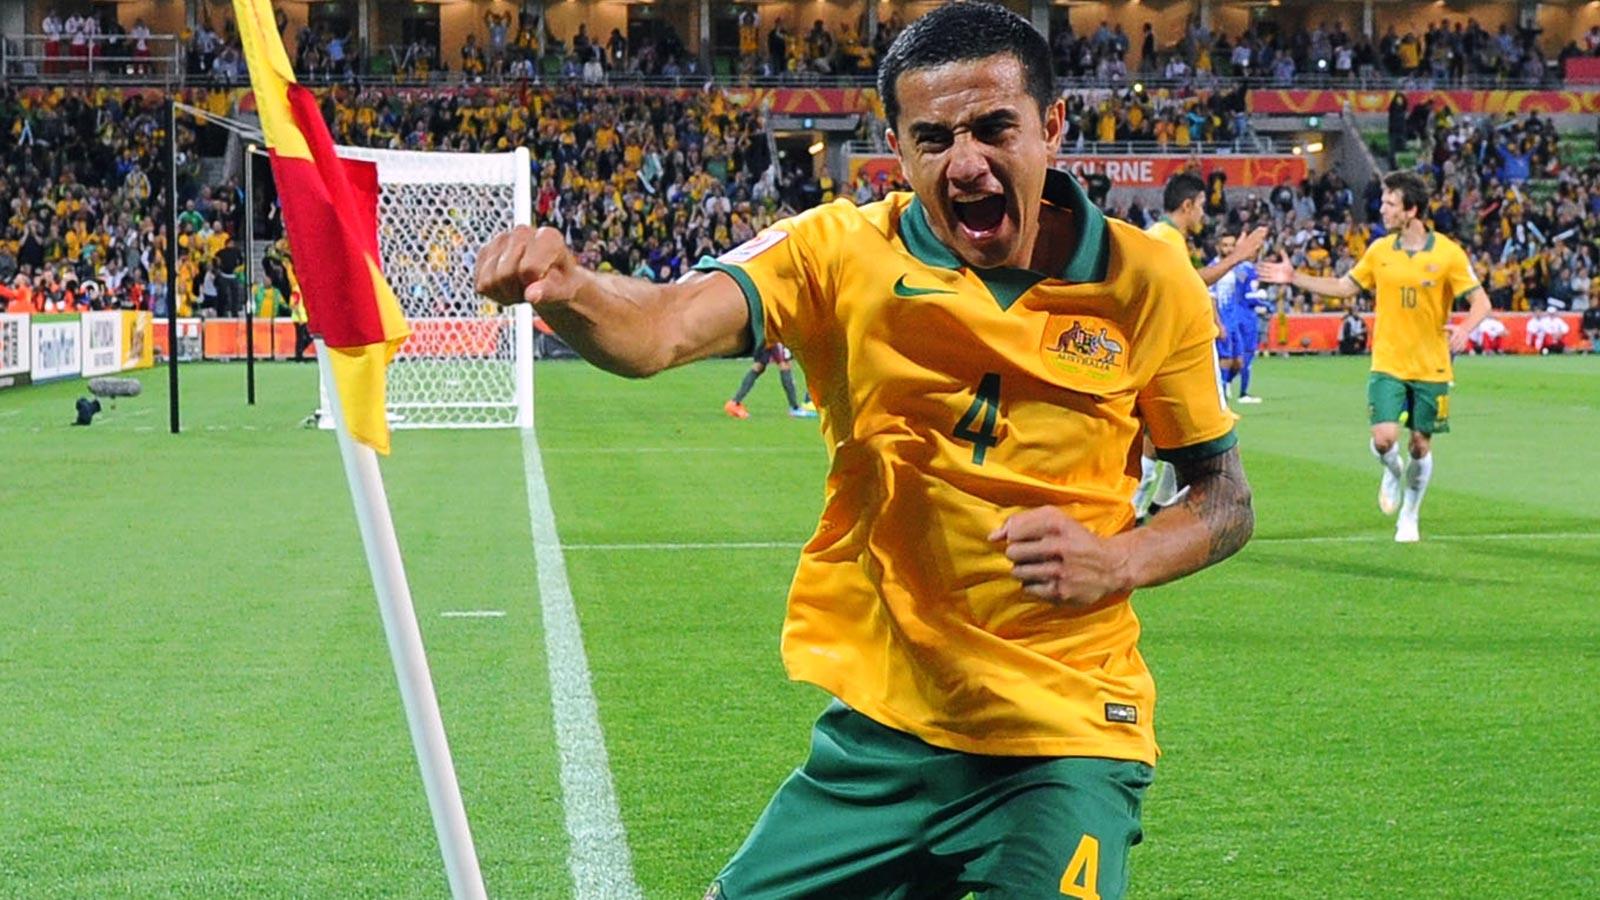 010915-Soccer-Australia-Tim-Cahill-JW-PI